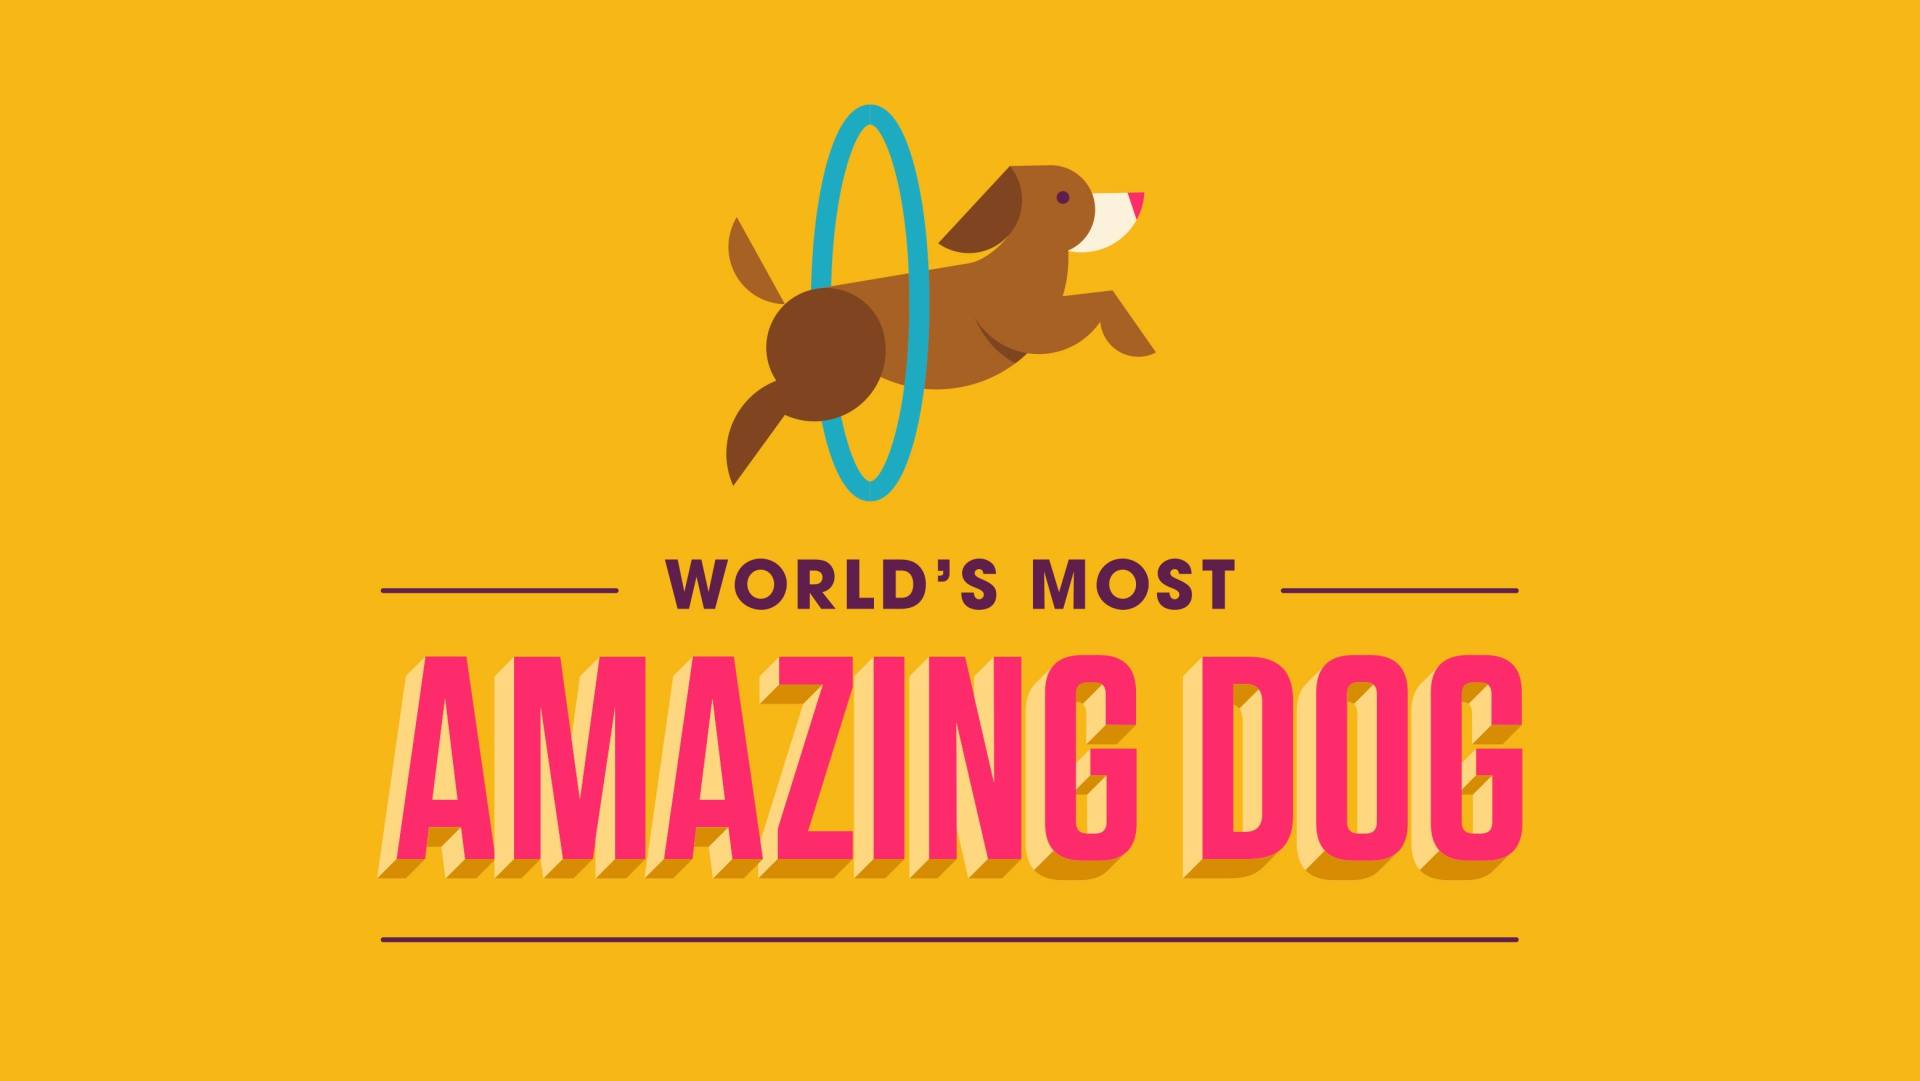 worlds-most-amazing-dog.jpg